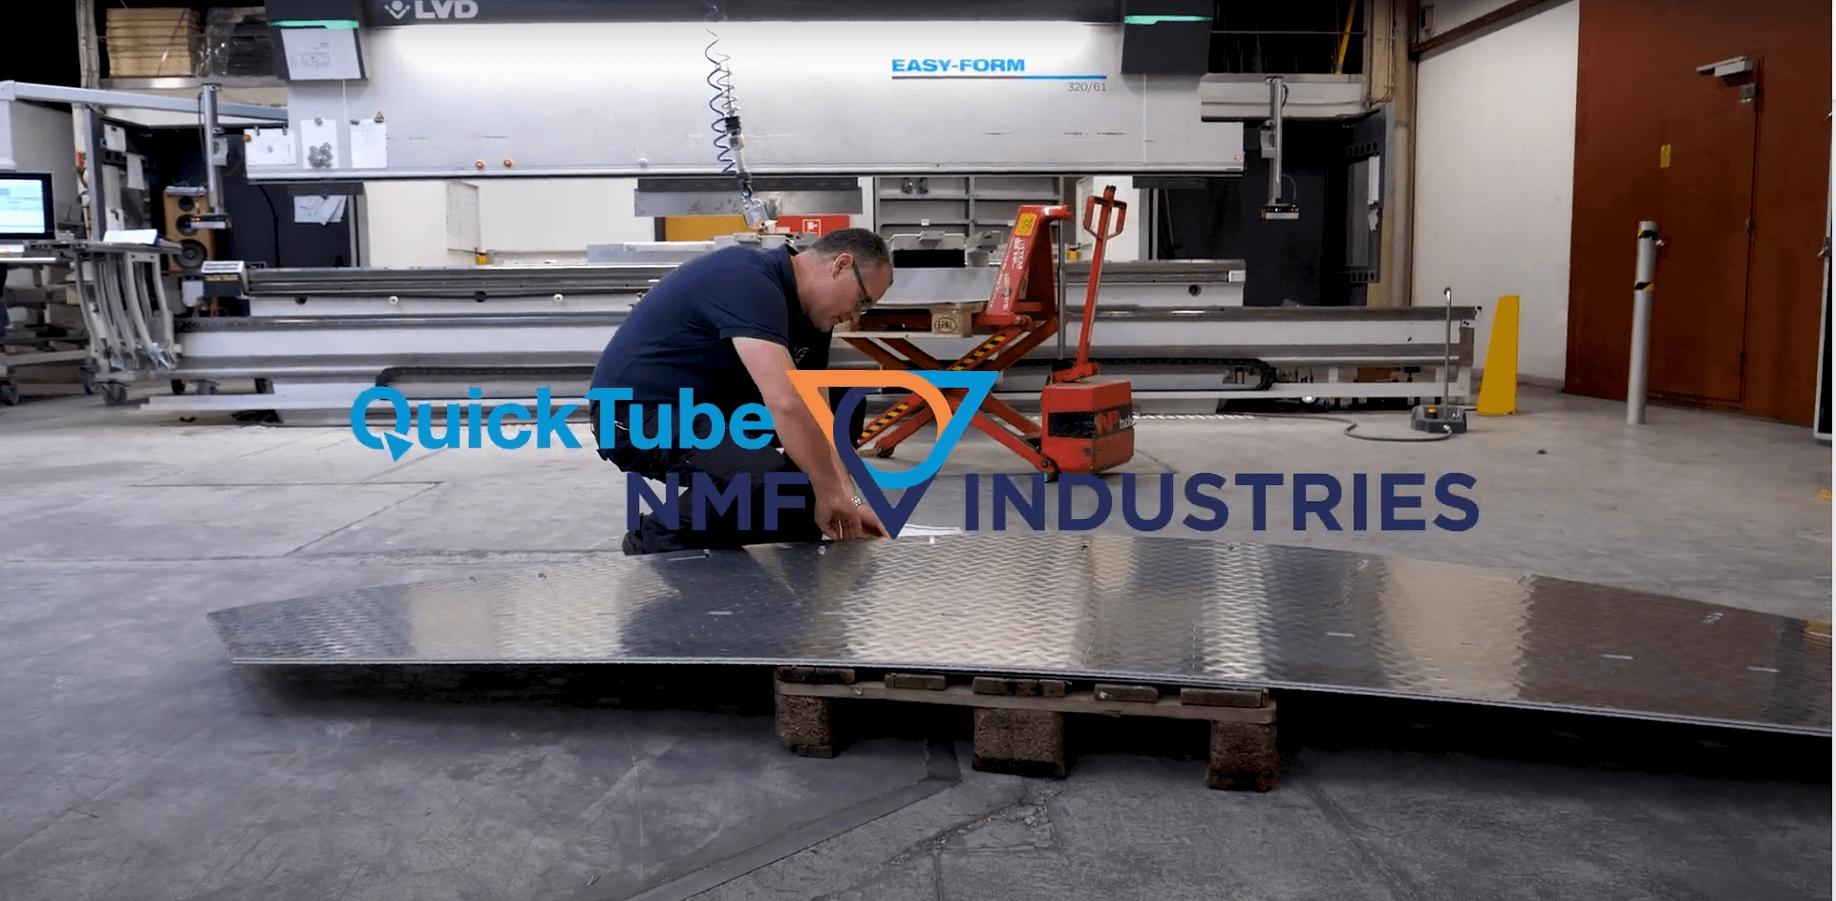 QuickTube NMF Industries kan levere pladebearbejdning til hele industrien